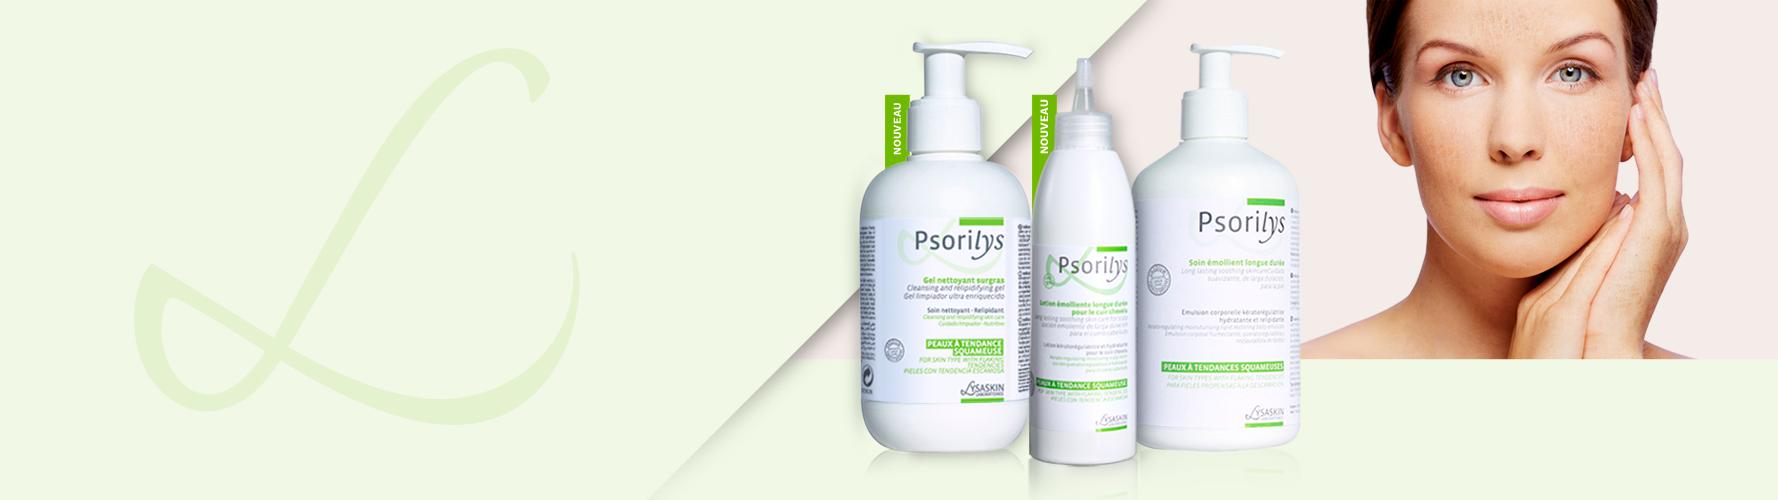 Psorilys